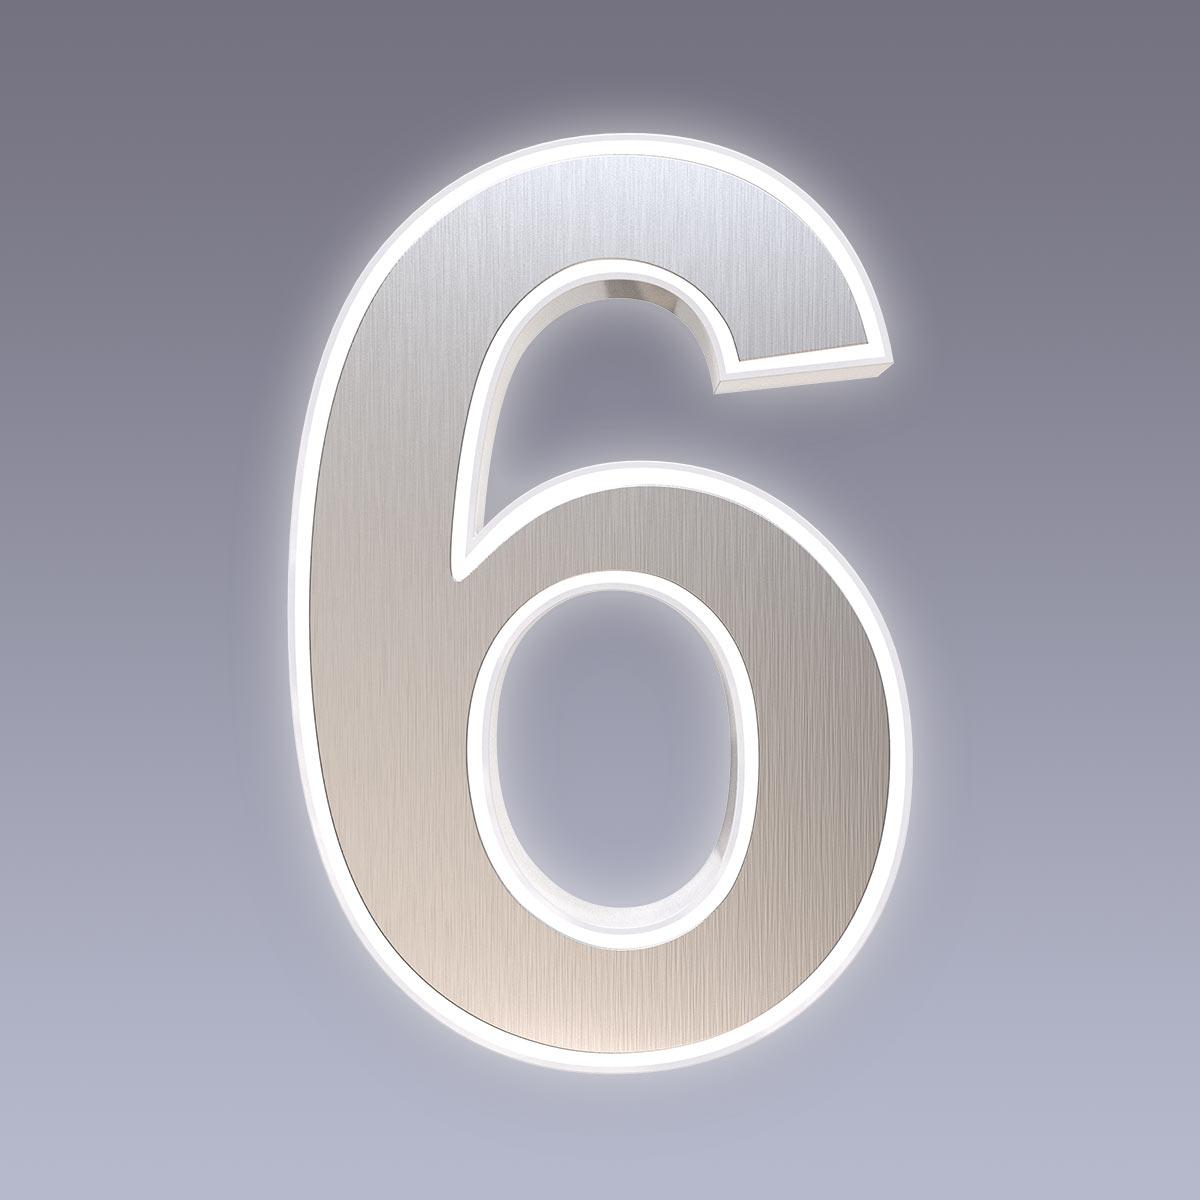 Cover für 15cm Hausnummer 6 Edelstahl Arial selbstklebend